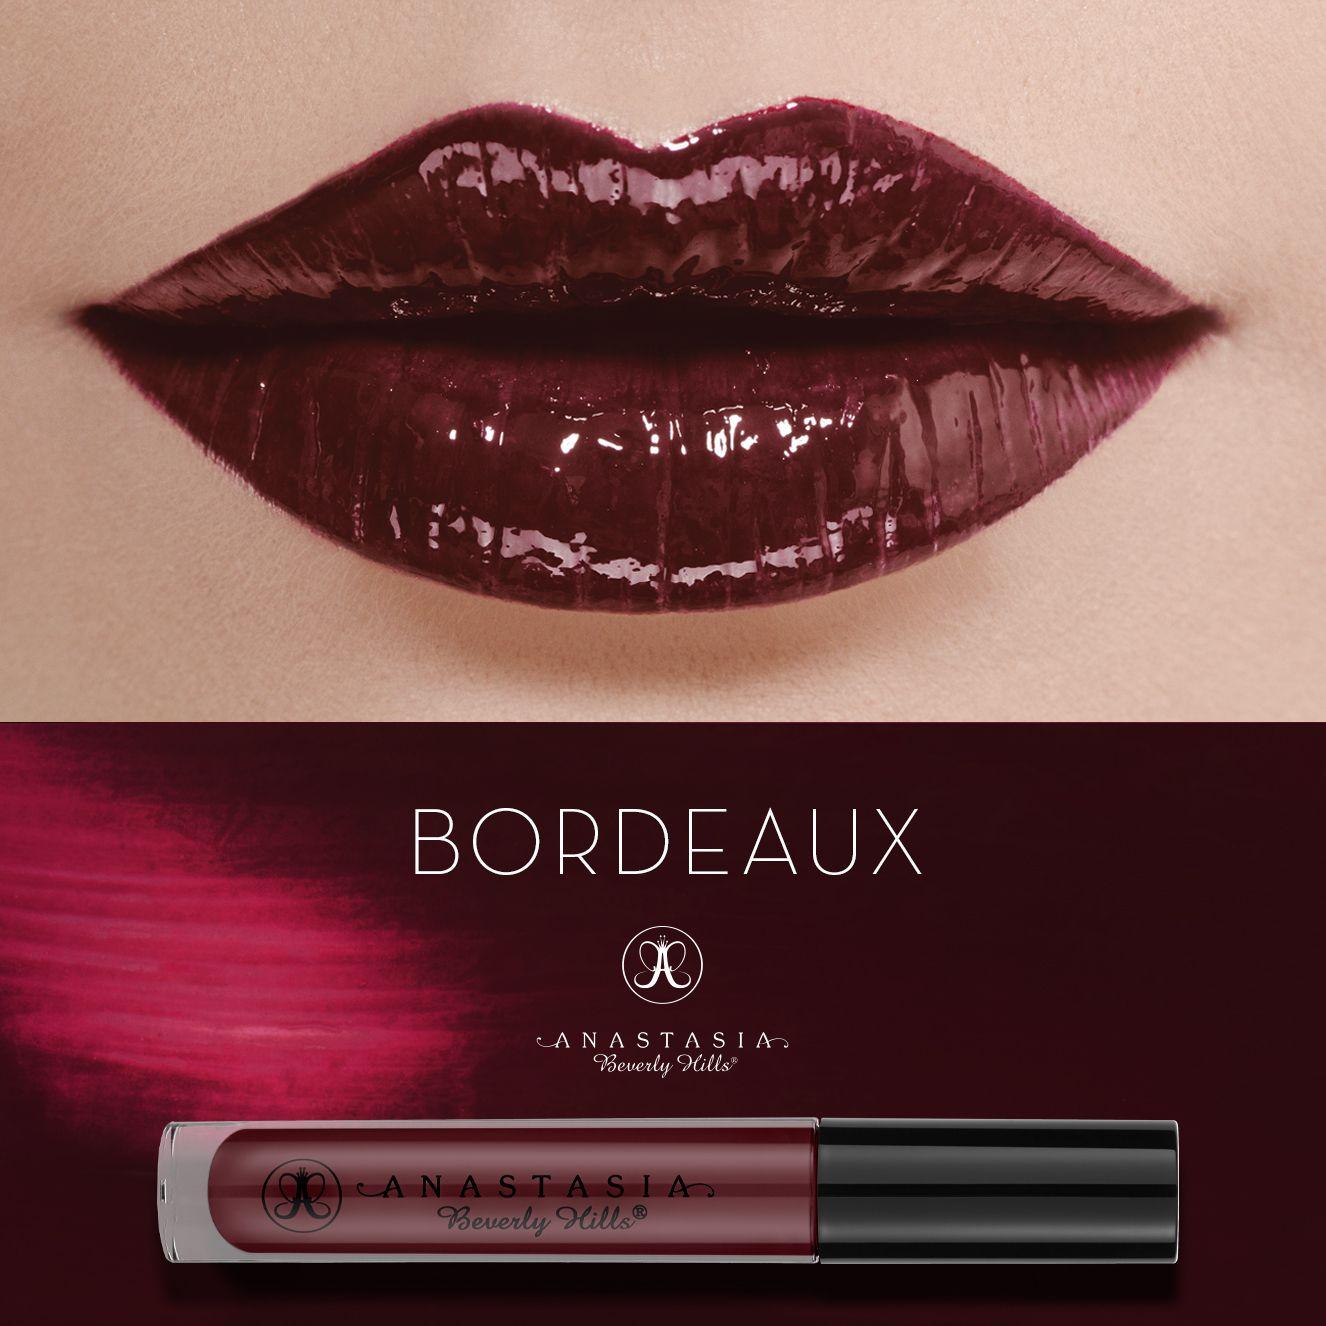 Bordeaux on the lips. #LipGloss #AnastasiaBeverlyHills